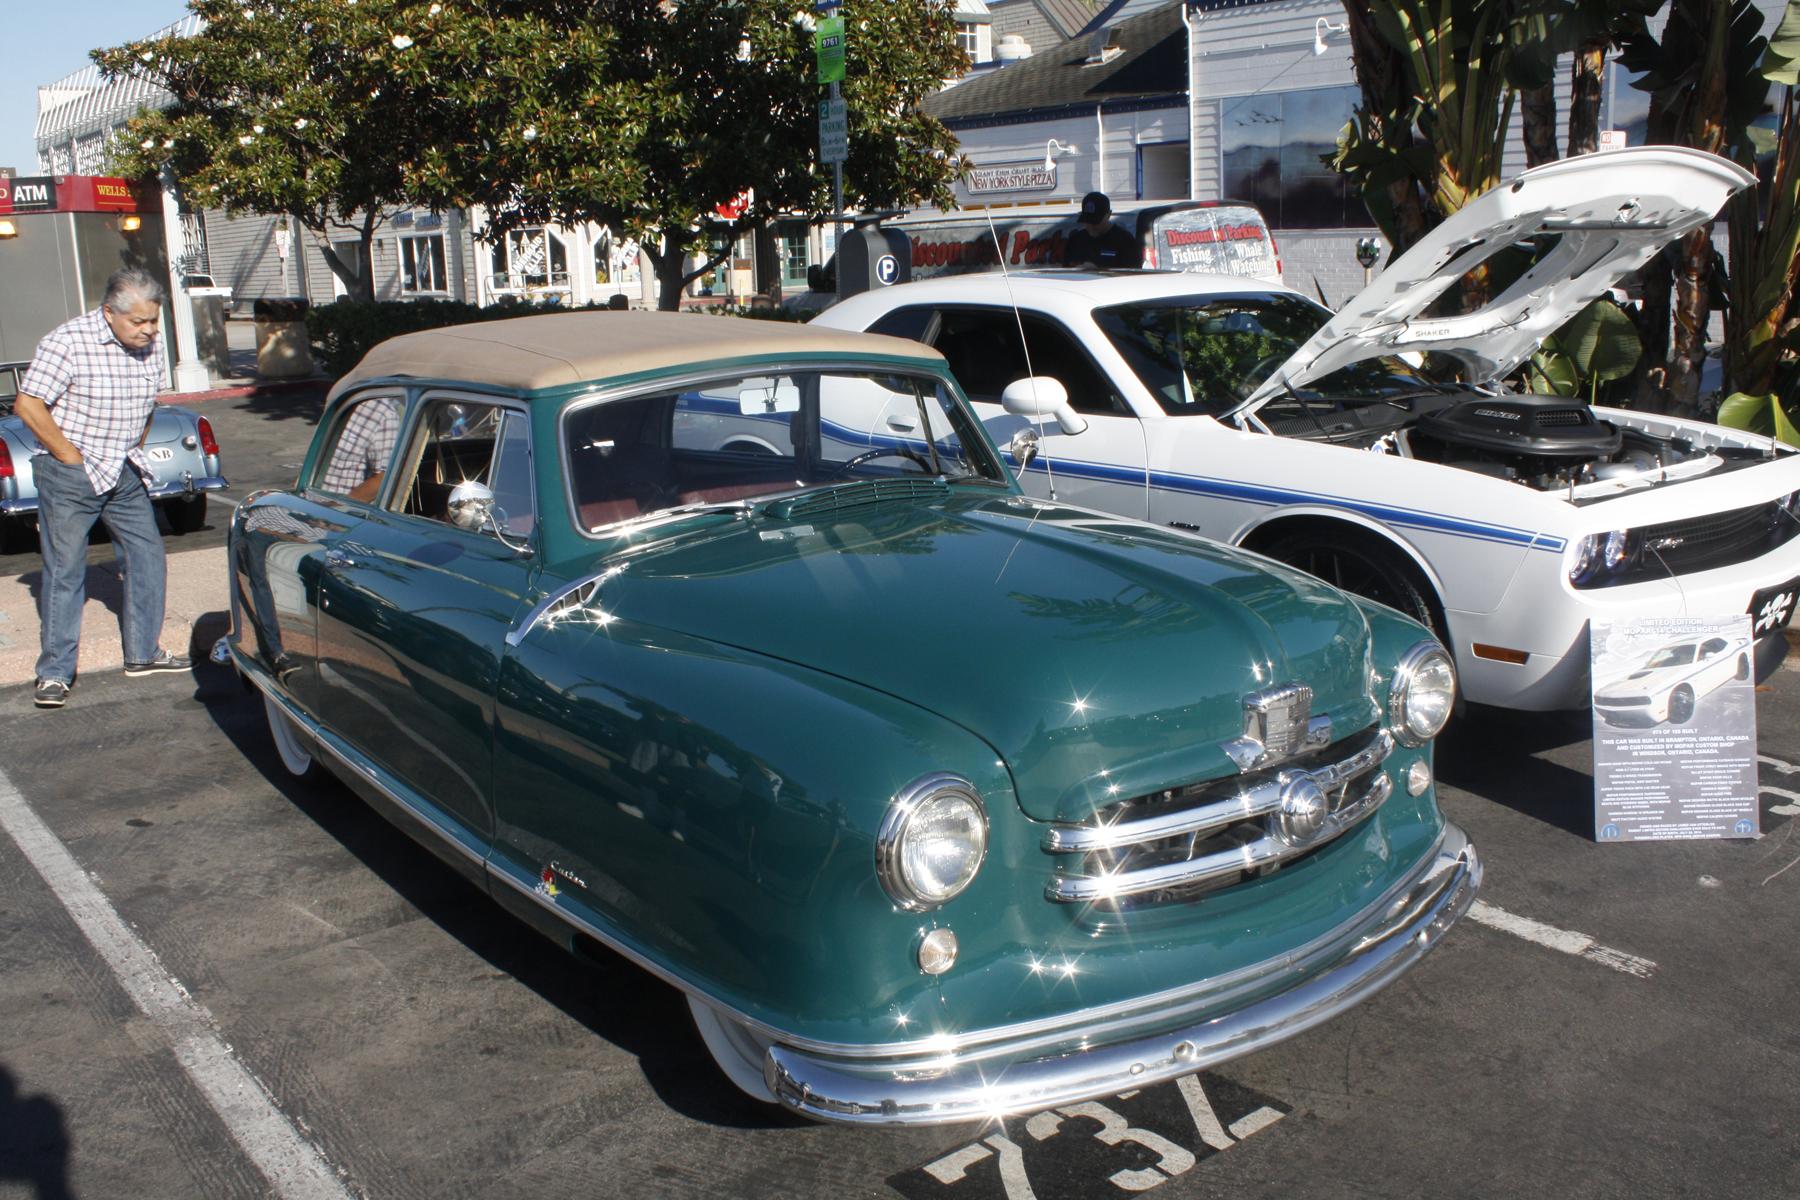 Newport Beach Local News Local Focus Balboa Car Show Offers Classic - Major car shows